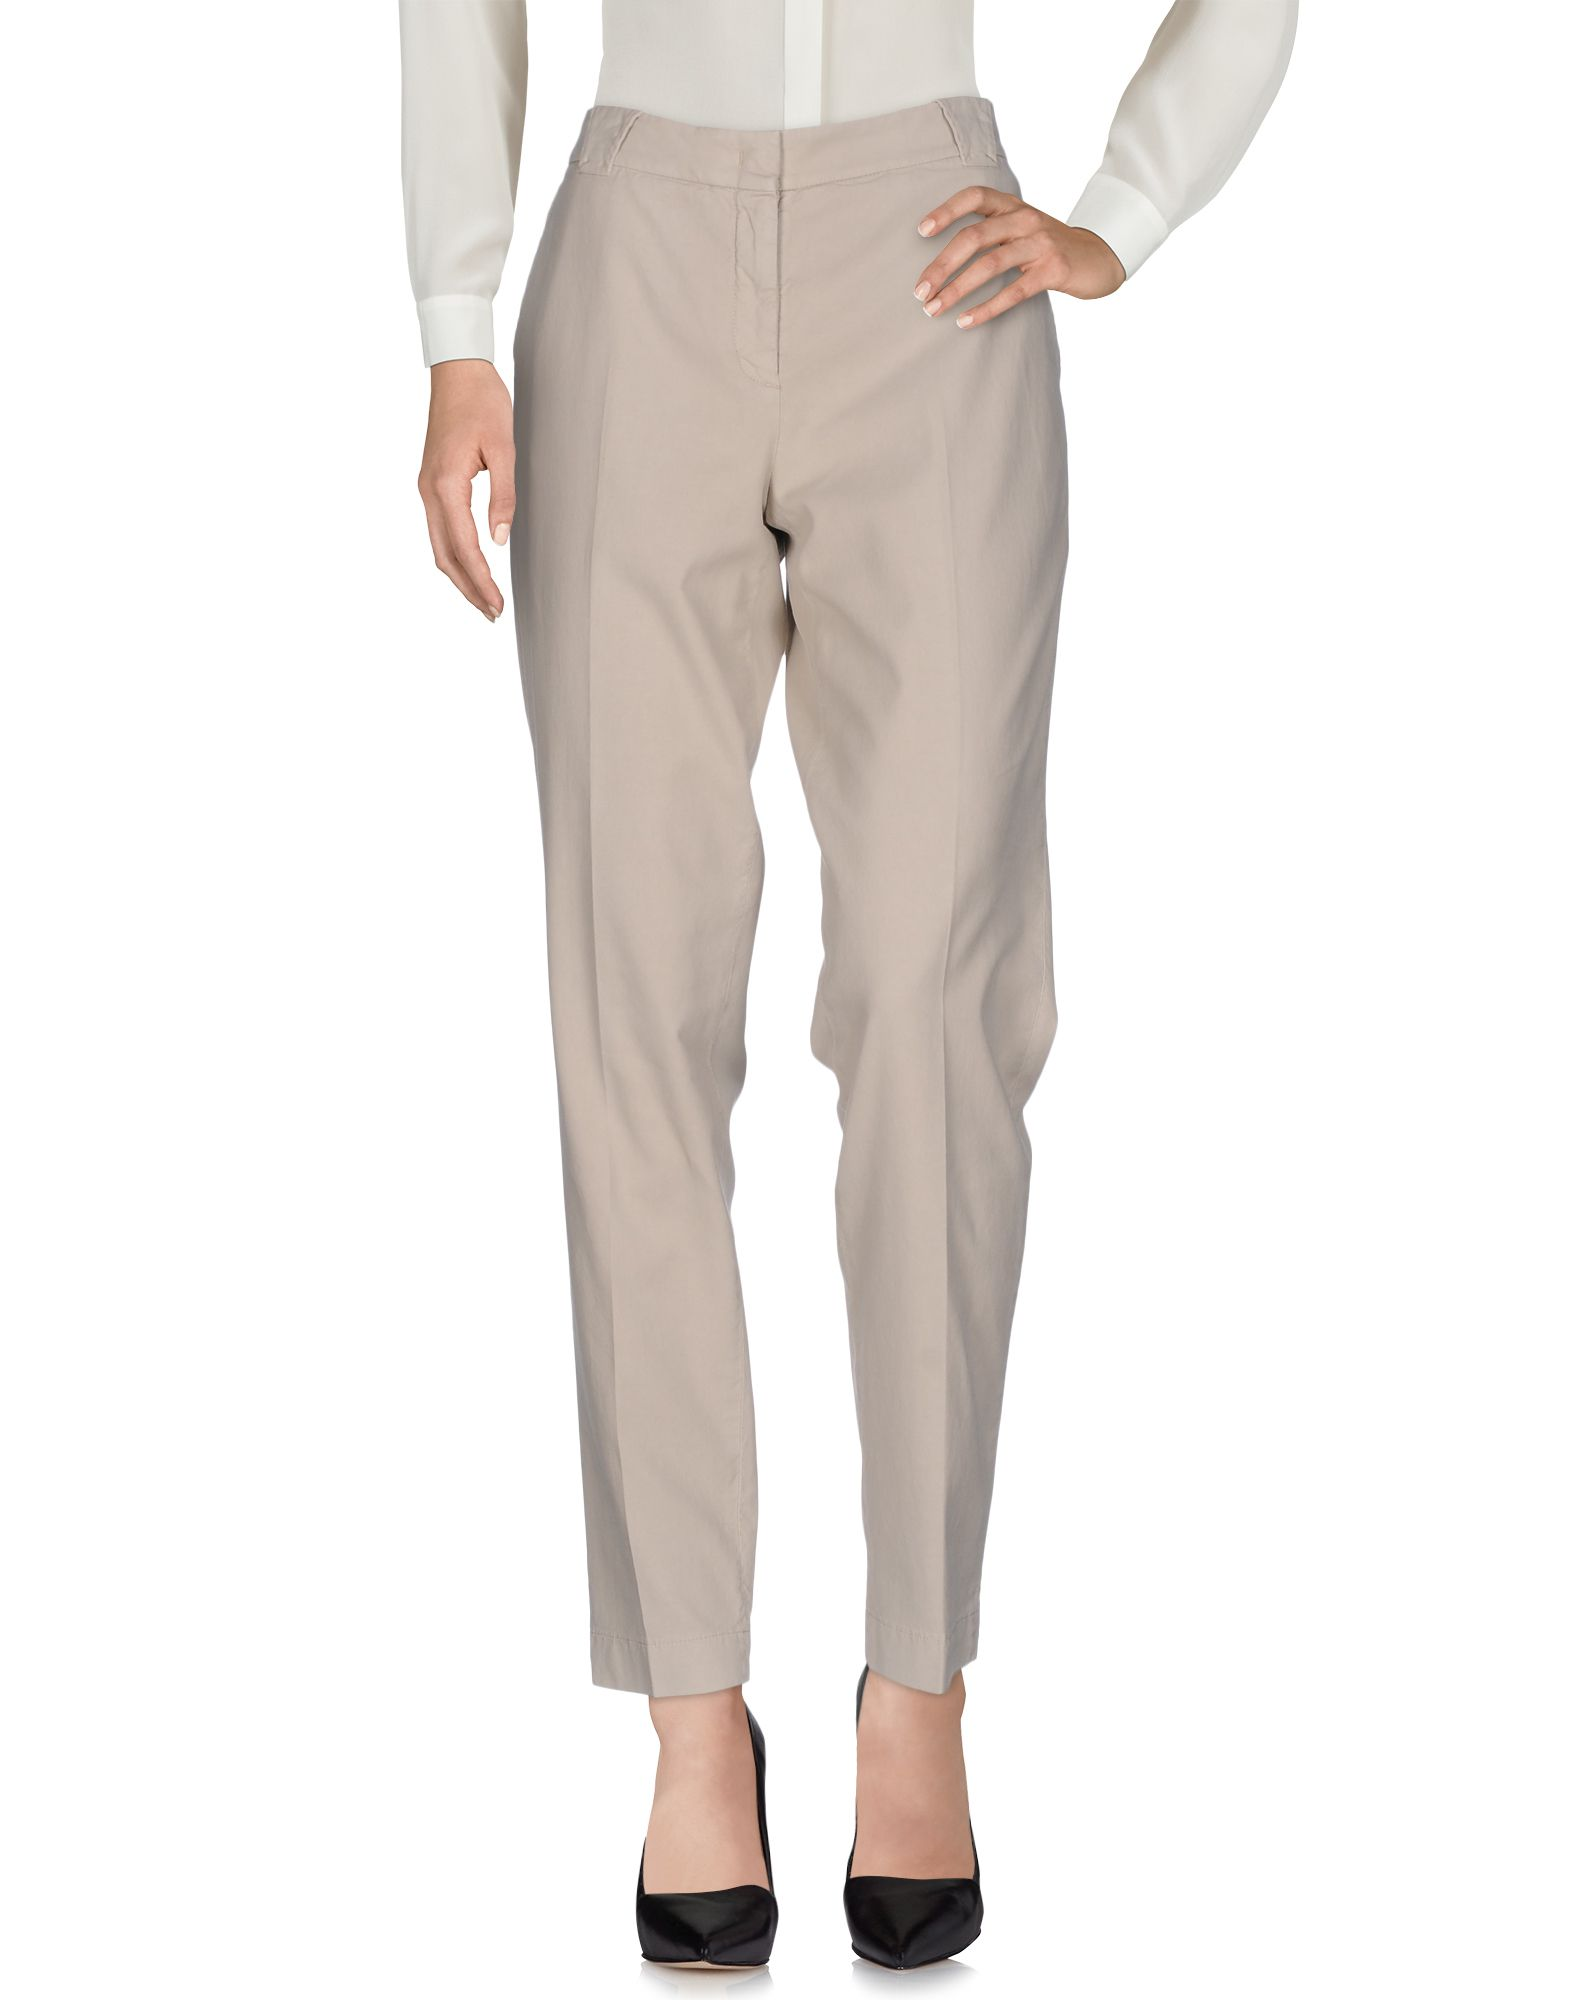 INCOTEX Damen Hose Farbe Hellgrau Größe 7 - broschei